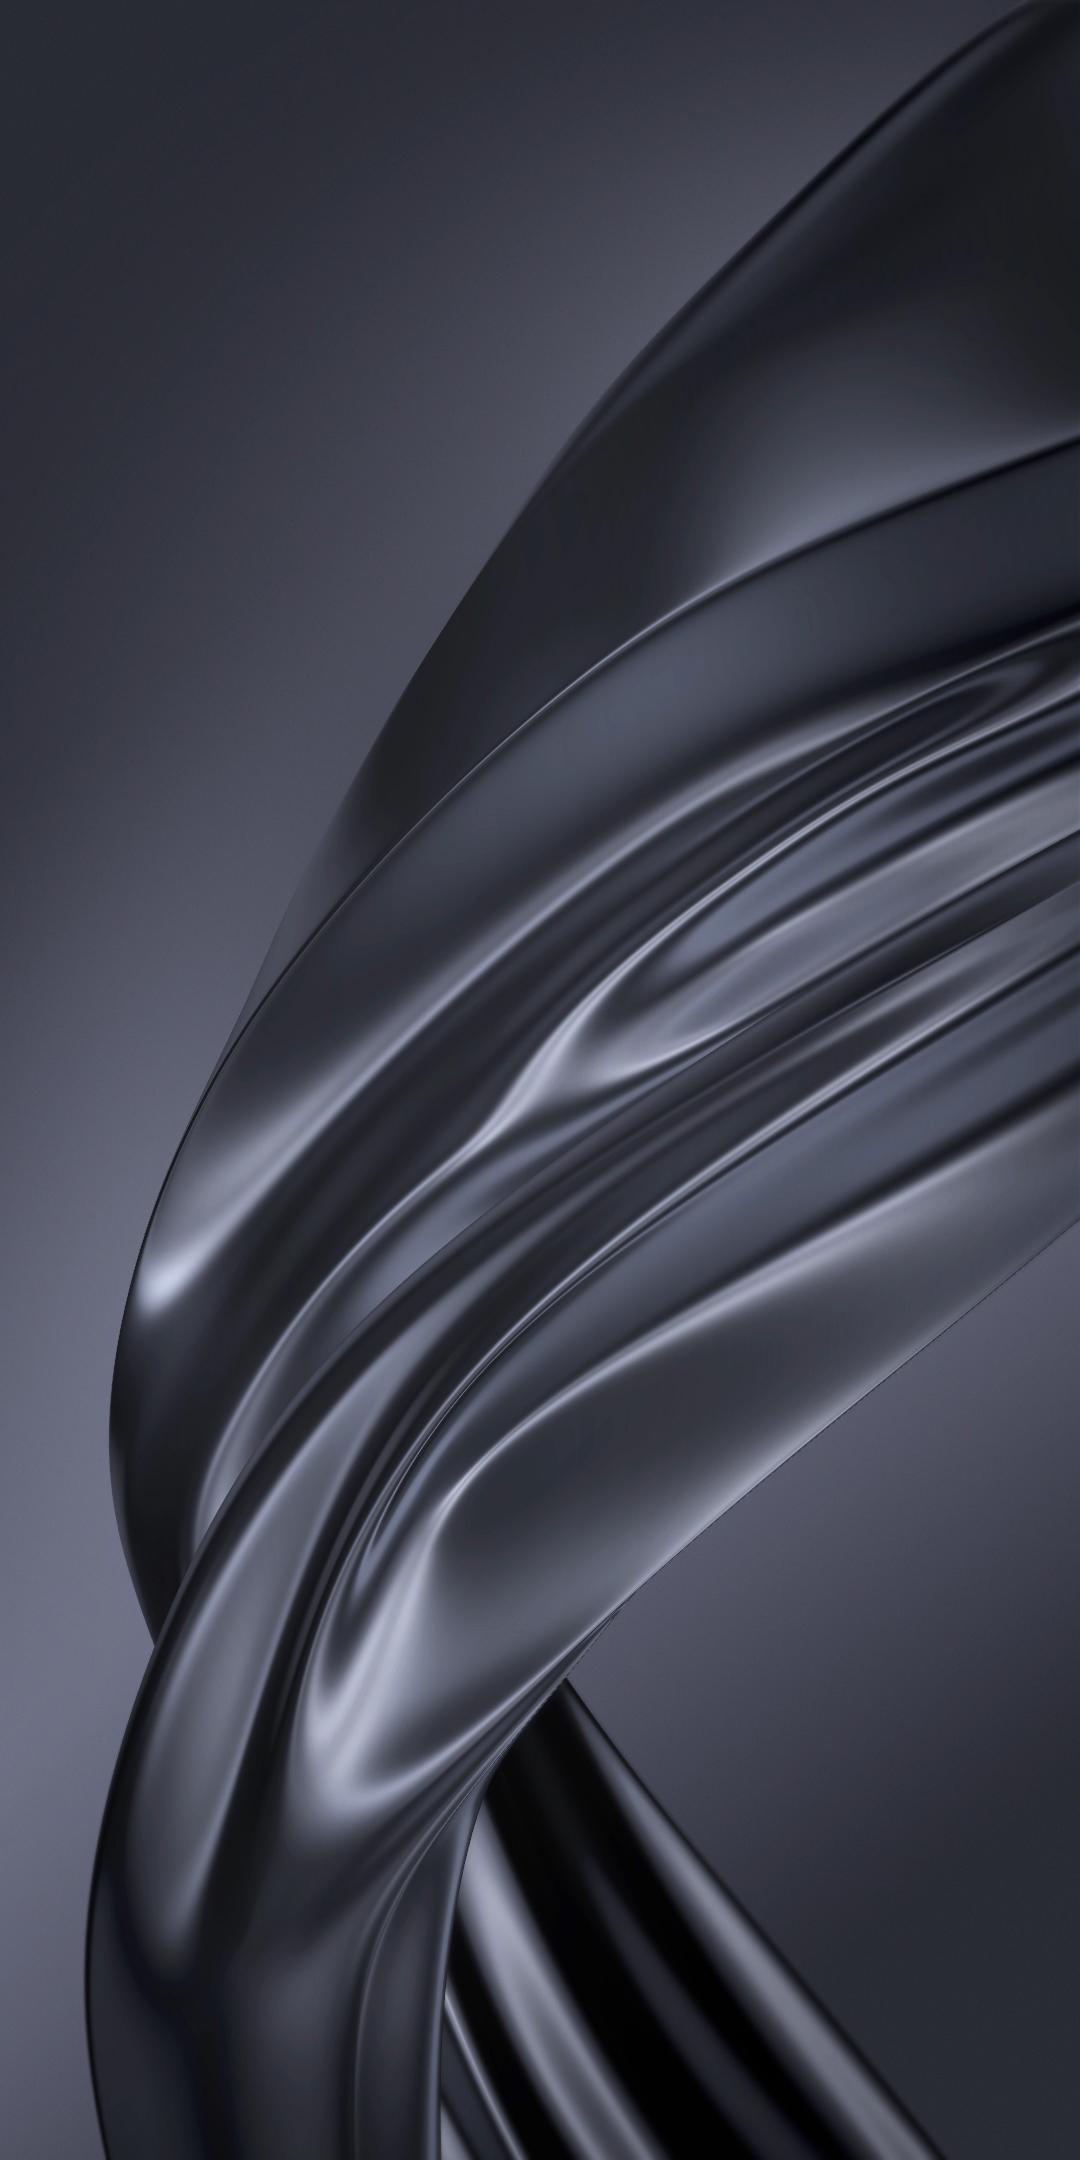 Xiaomi Mi Mix 2S Stock Full HD Plus Wallpapers Mohamedovic 02